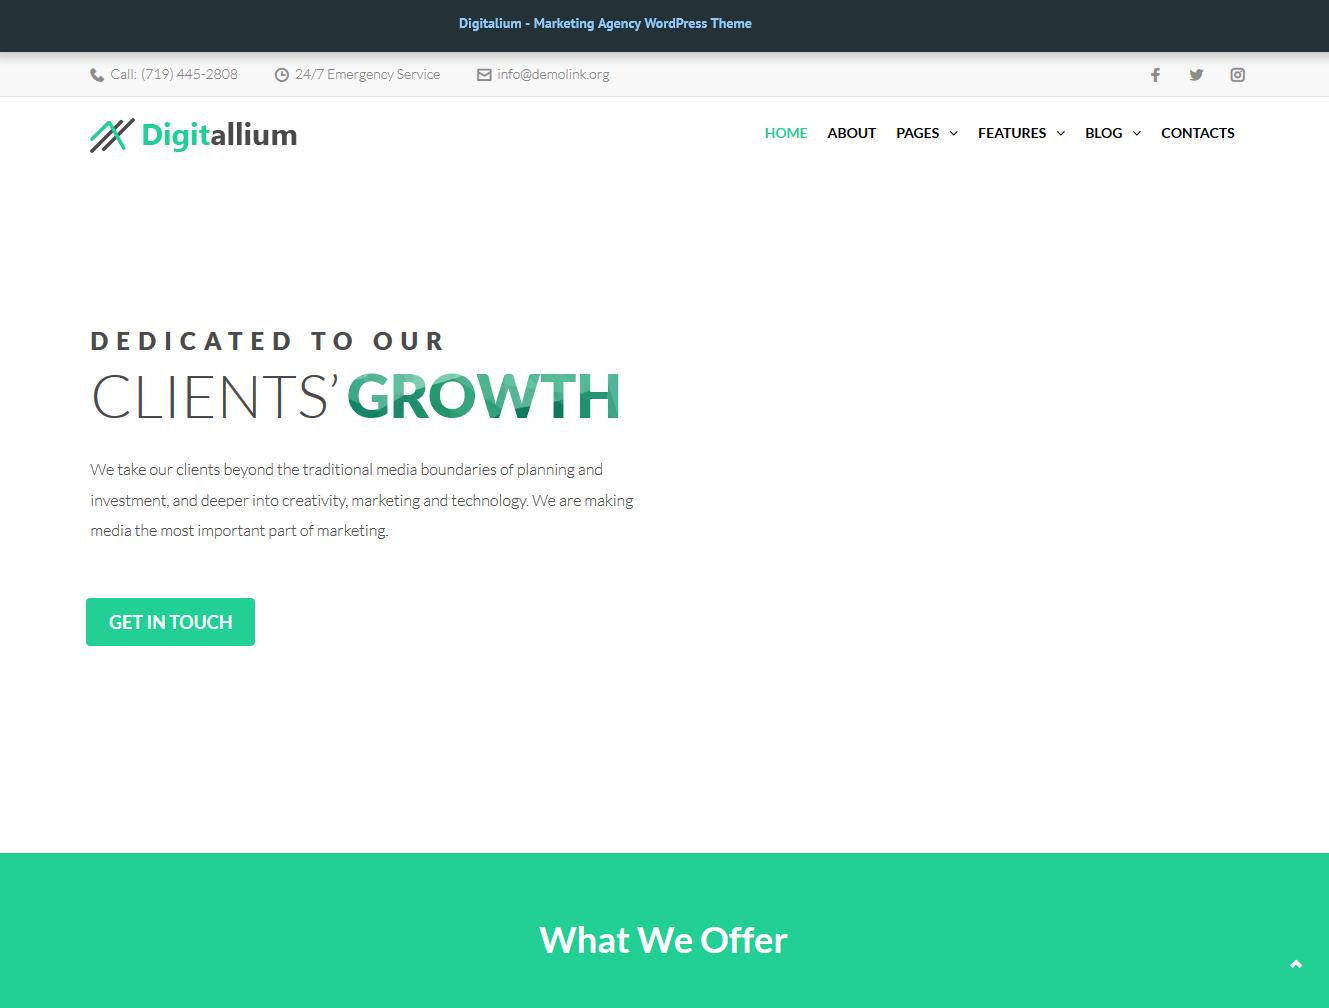 Digitalium Affiliate Marketing WordPress theme